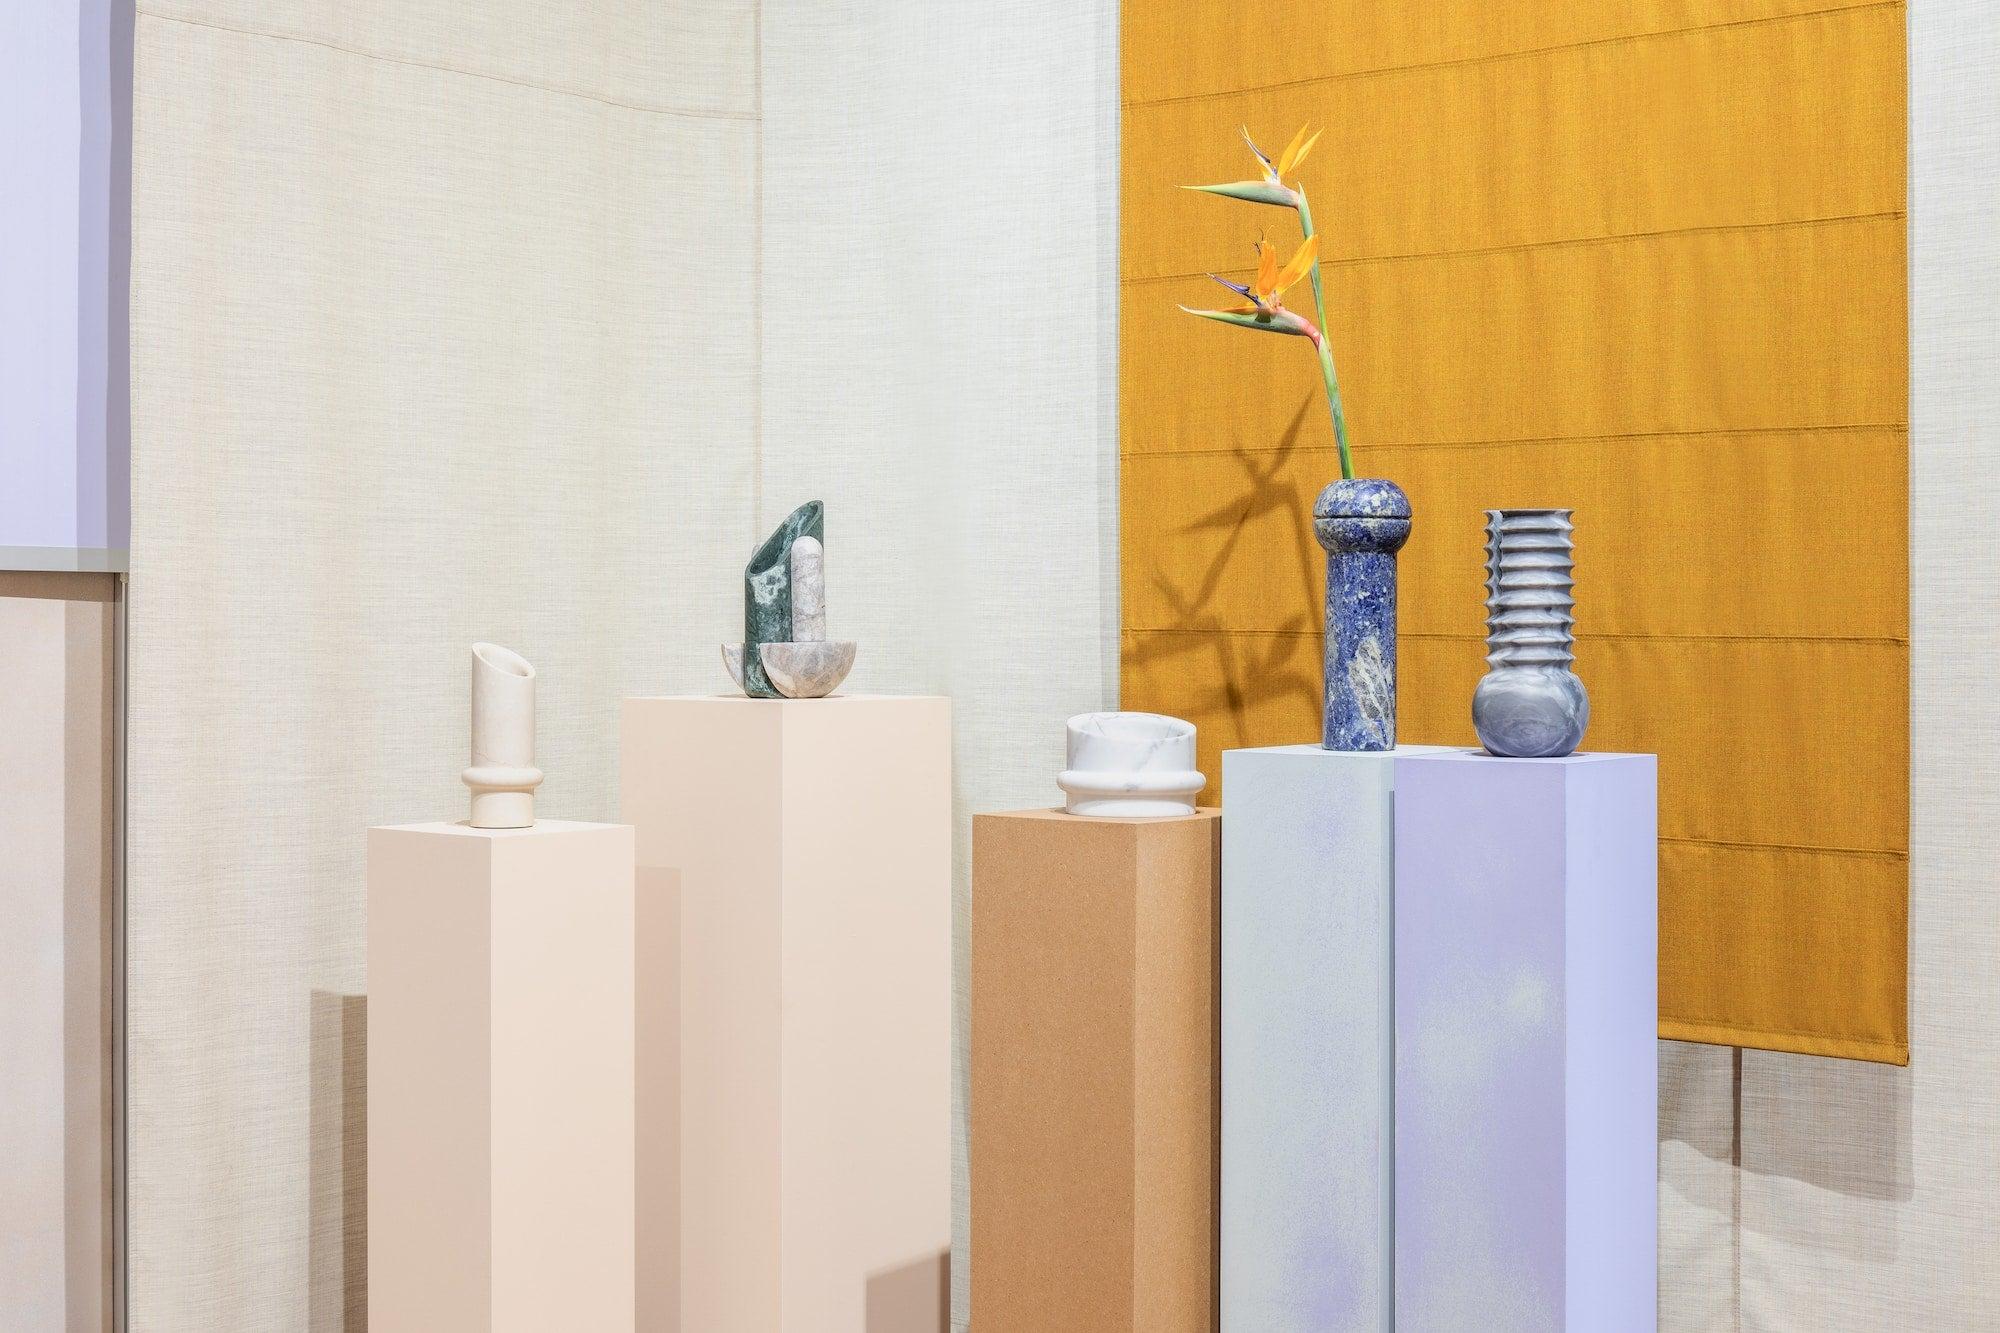 Simultanea marble vases by Valentina Cameranesi Sgroi at SEM